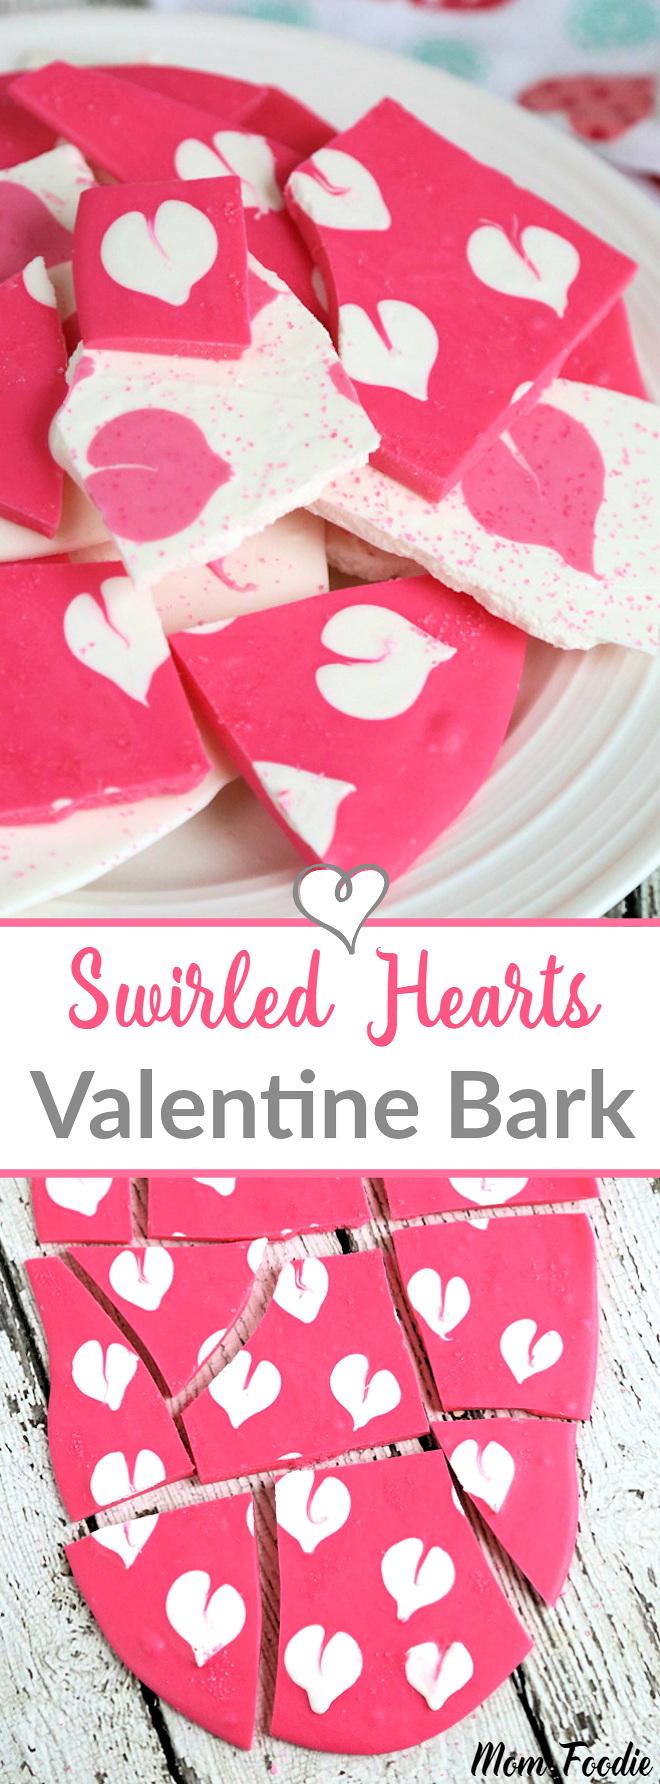 Valentine's Chocolate Bark: Homemade Candy